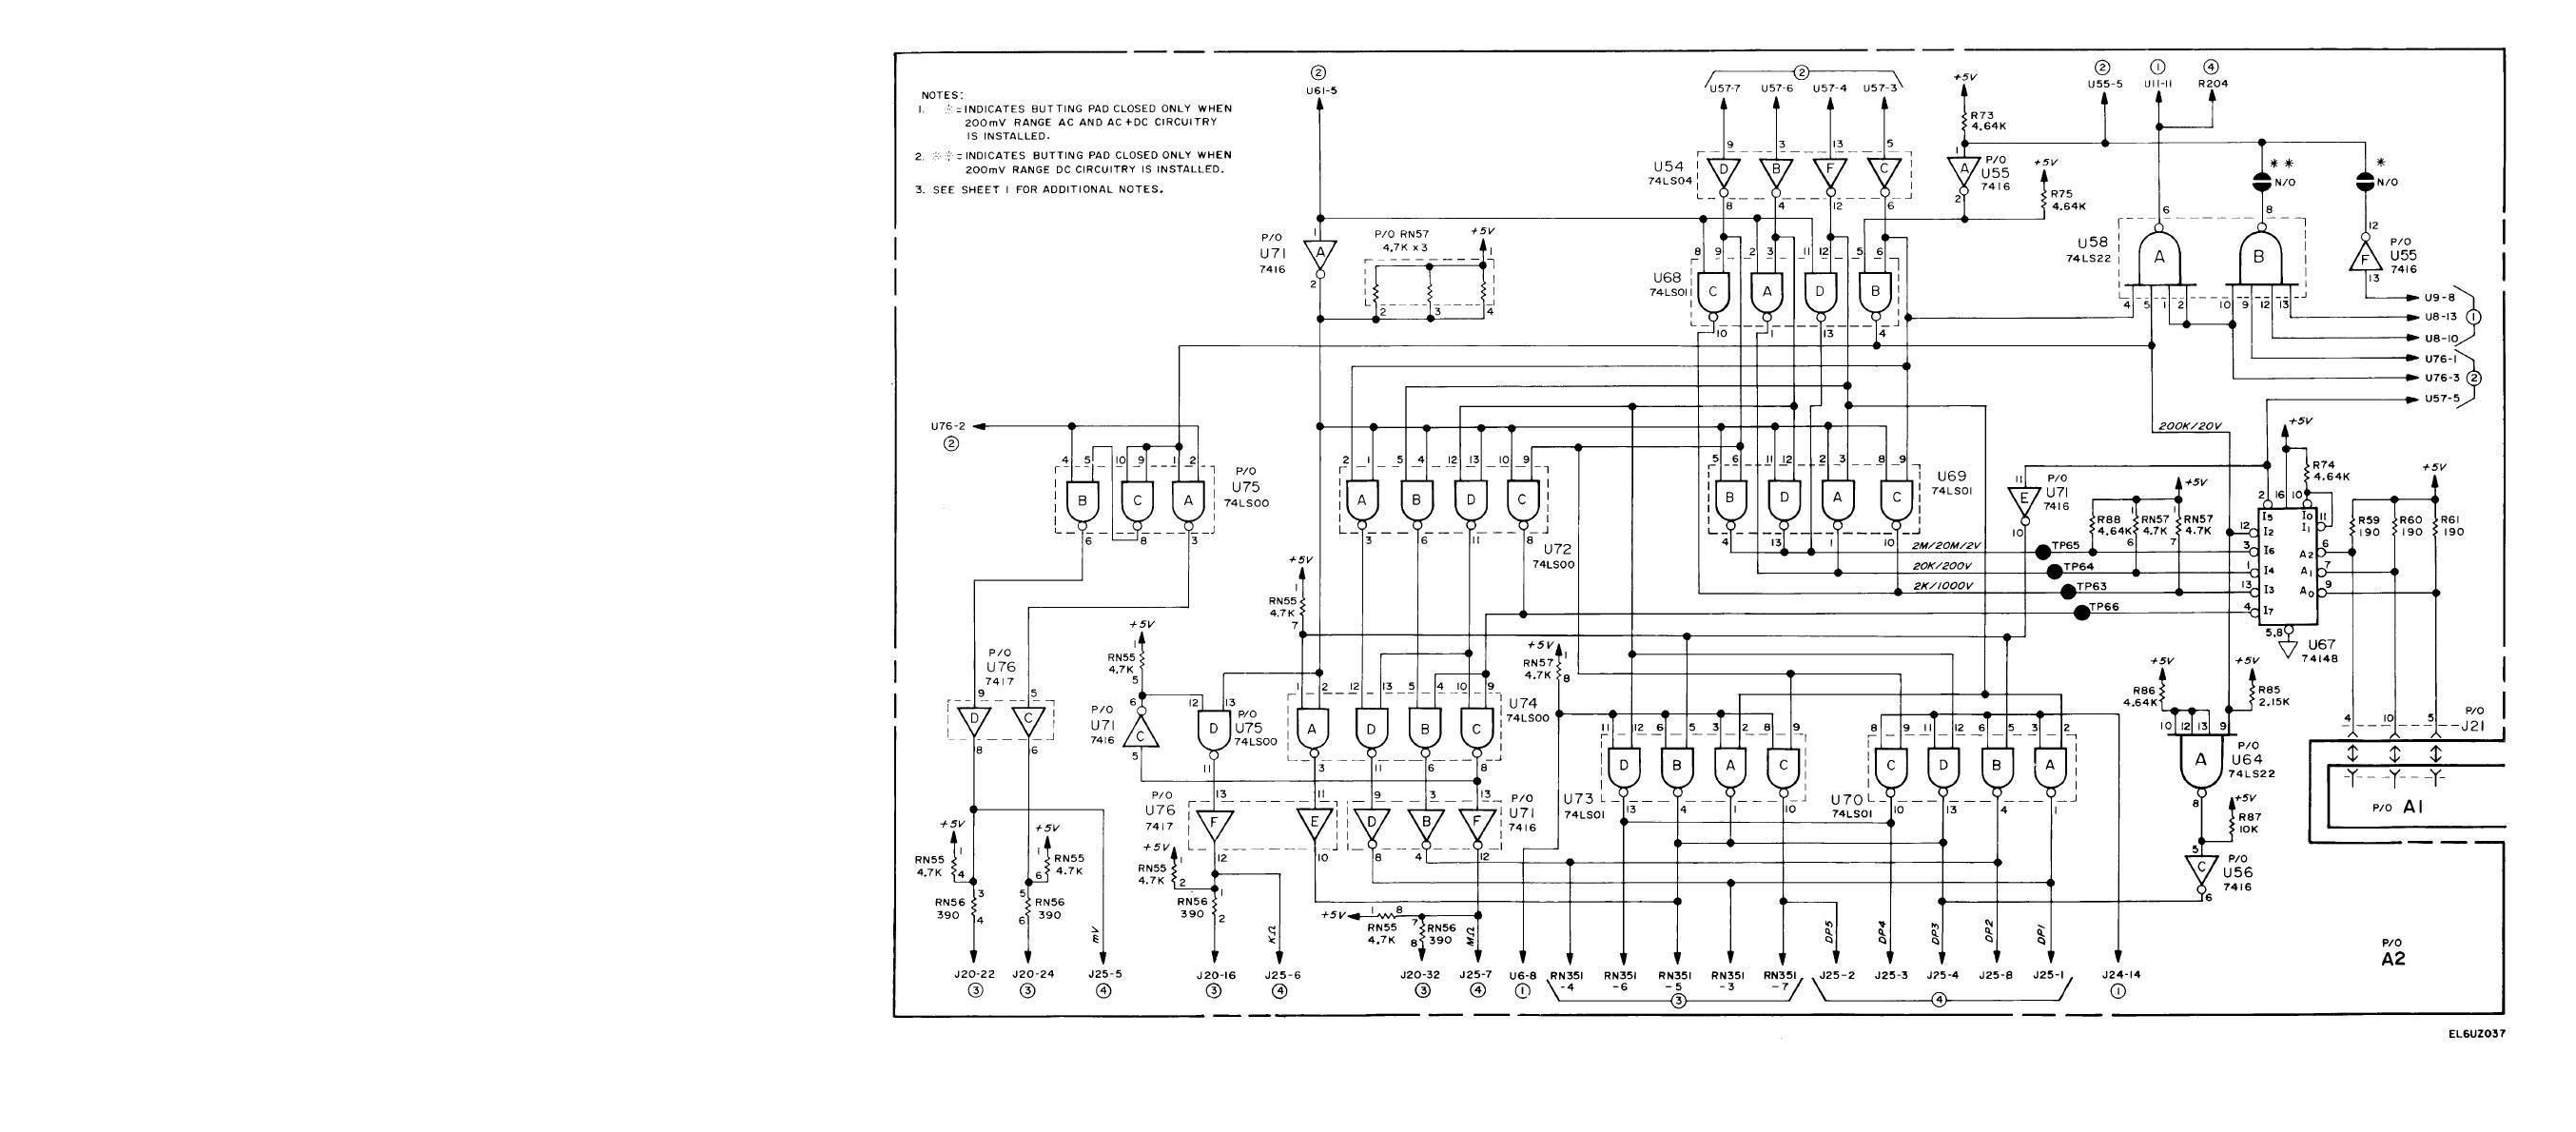 Figure FO-11. Range Encoder/DP Encoder Circuits (A2